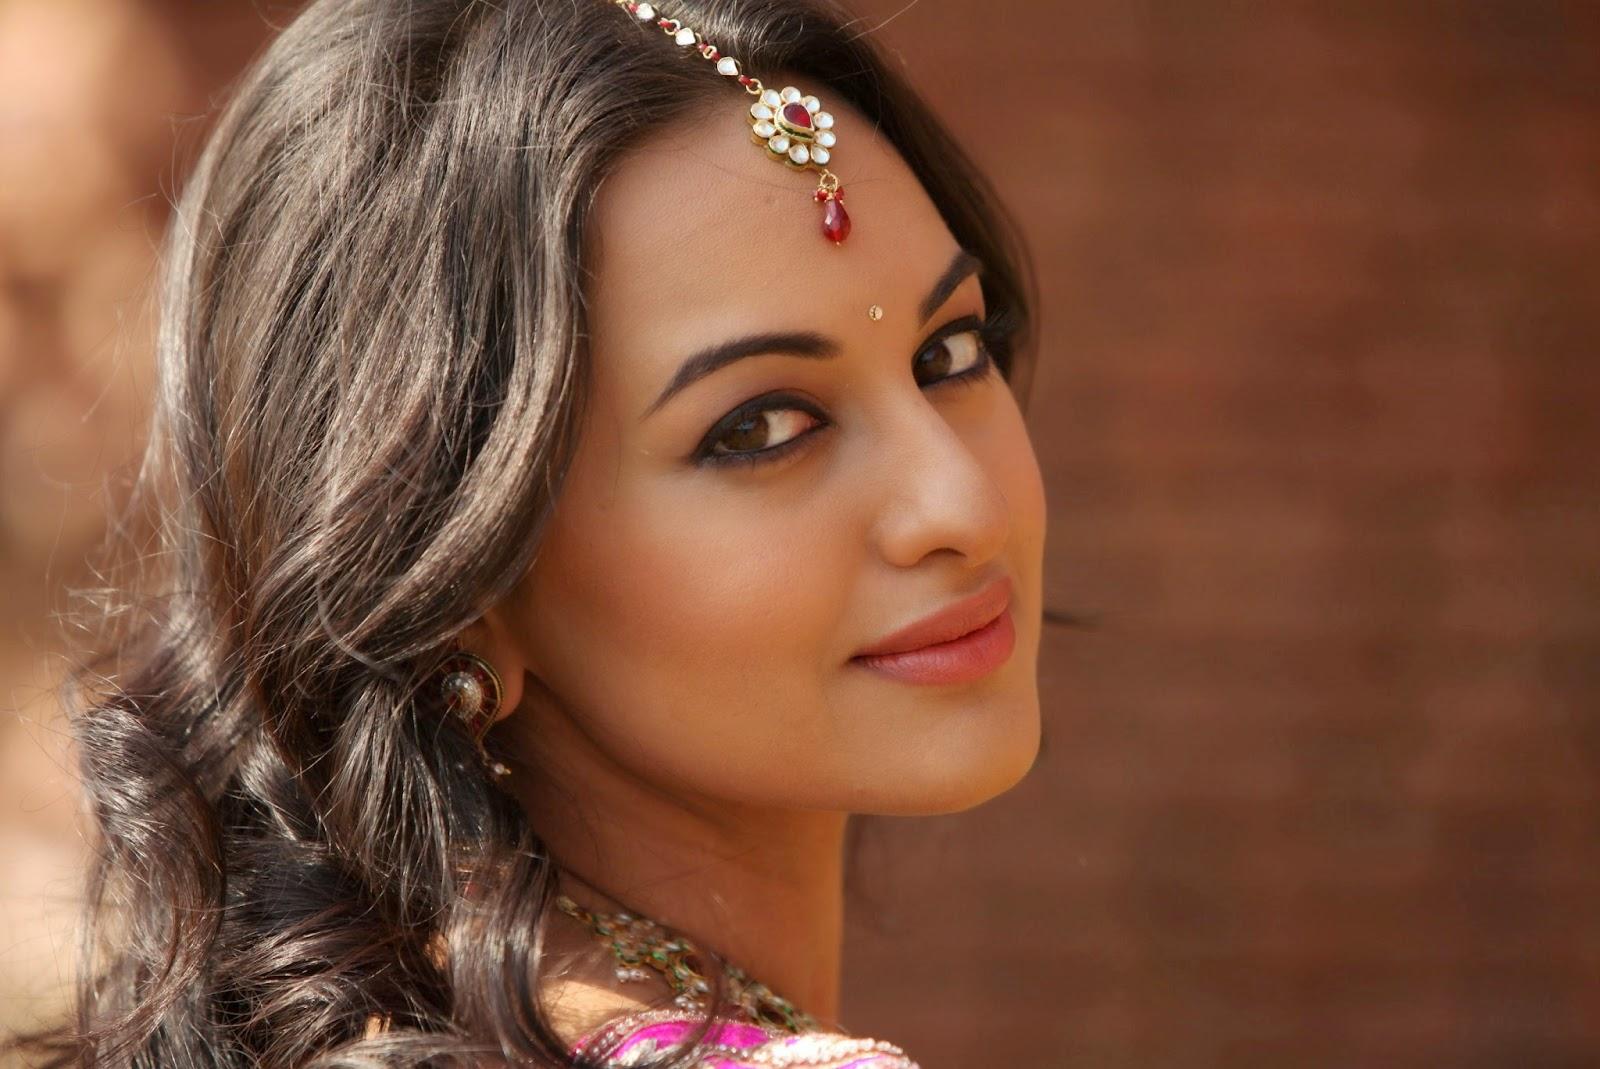 Bollywood Celebrity Sonakshi Sinha Bollywood Actress Sonakshi Sinha